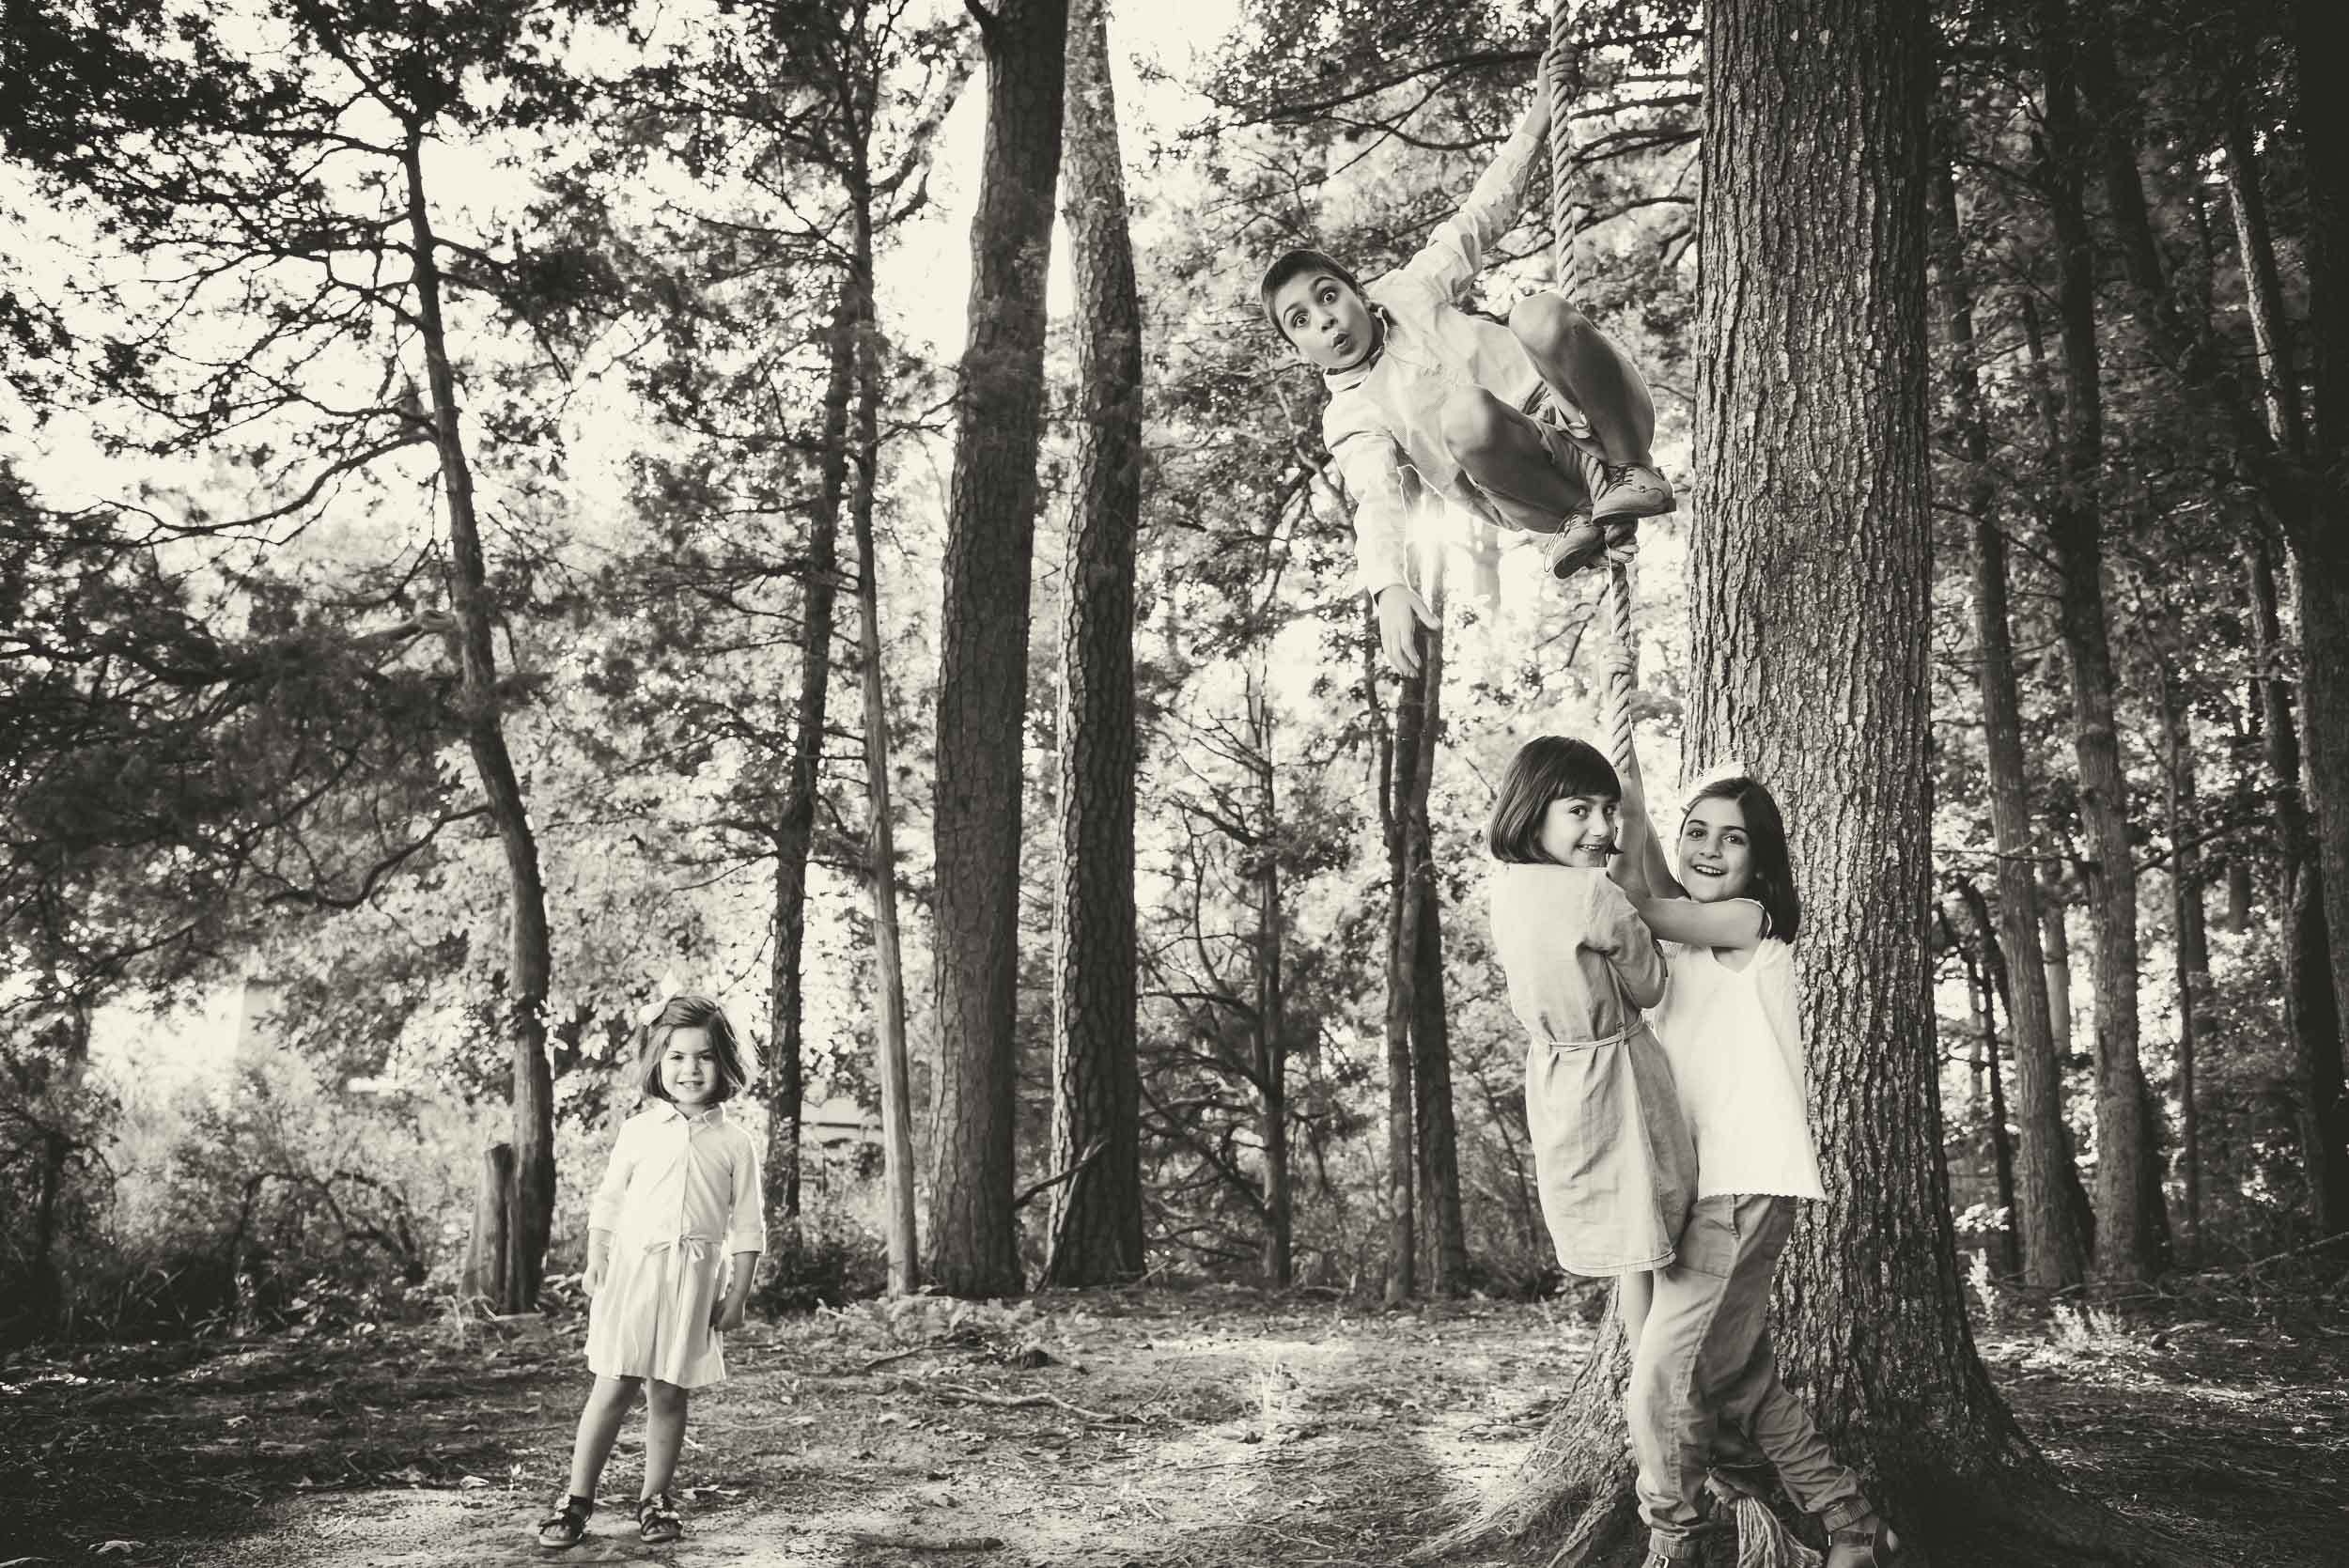 Family_Senior_Wedding_Maryland_Photographer_Sonny_and_Allison_Favorites_Easton_Crofton_Oxford-54.jpg